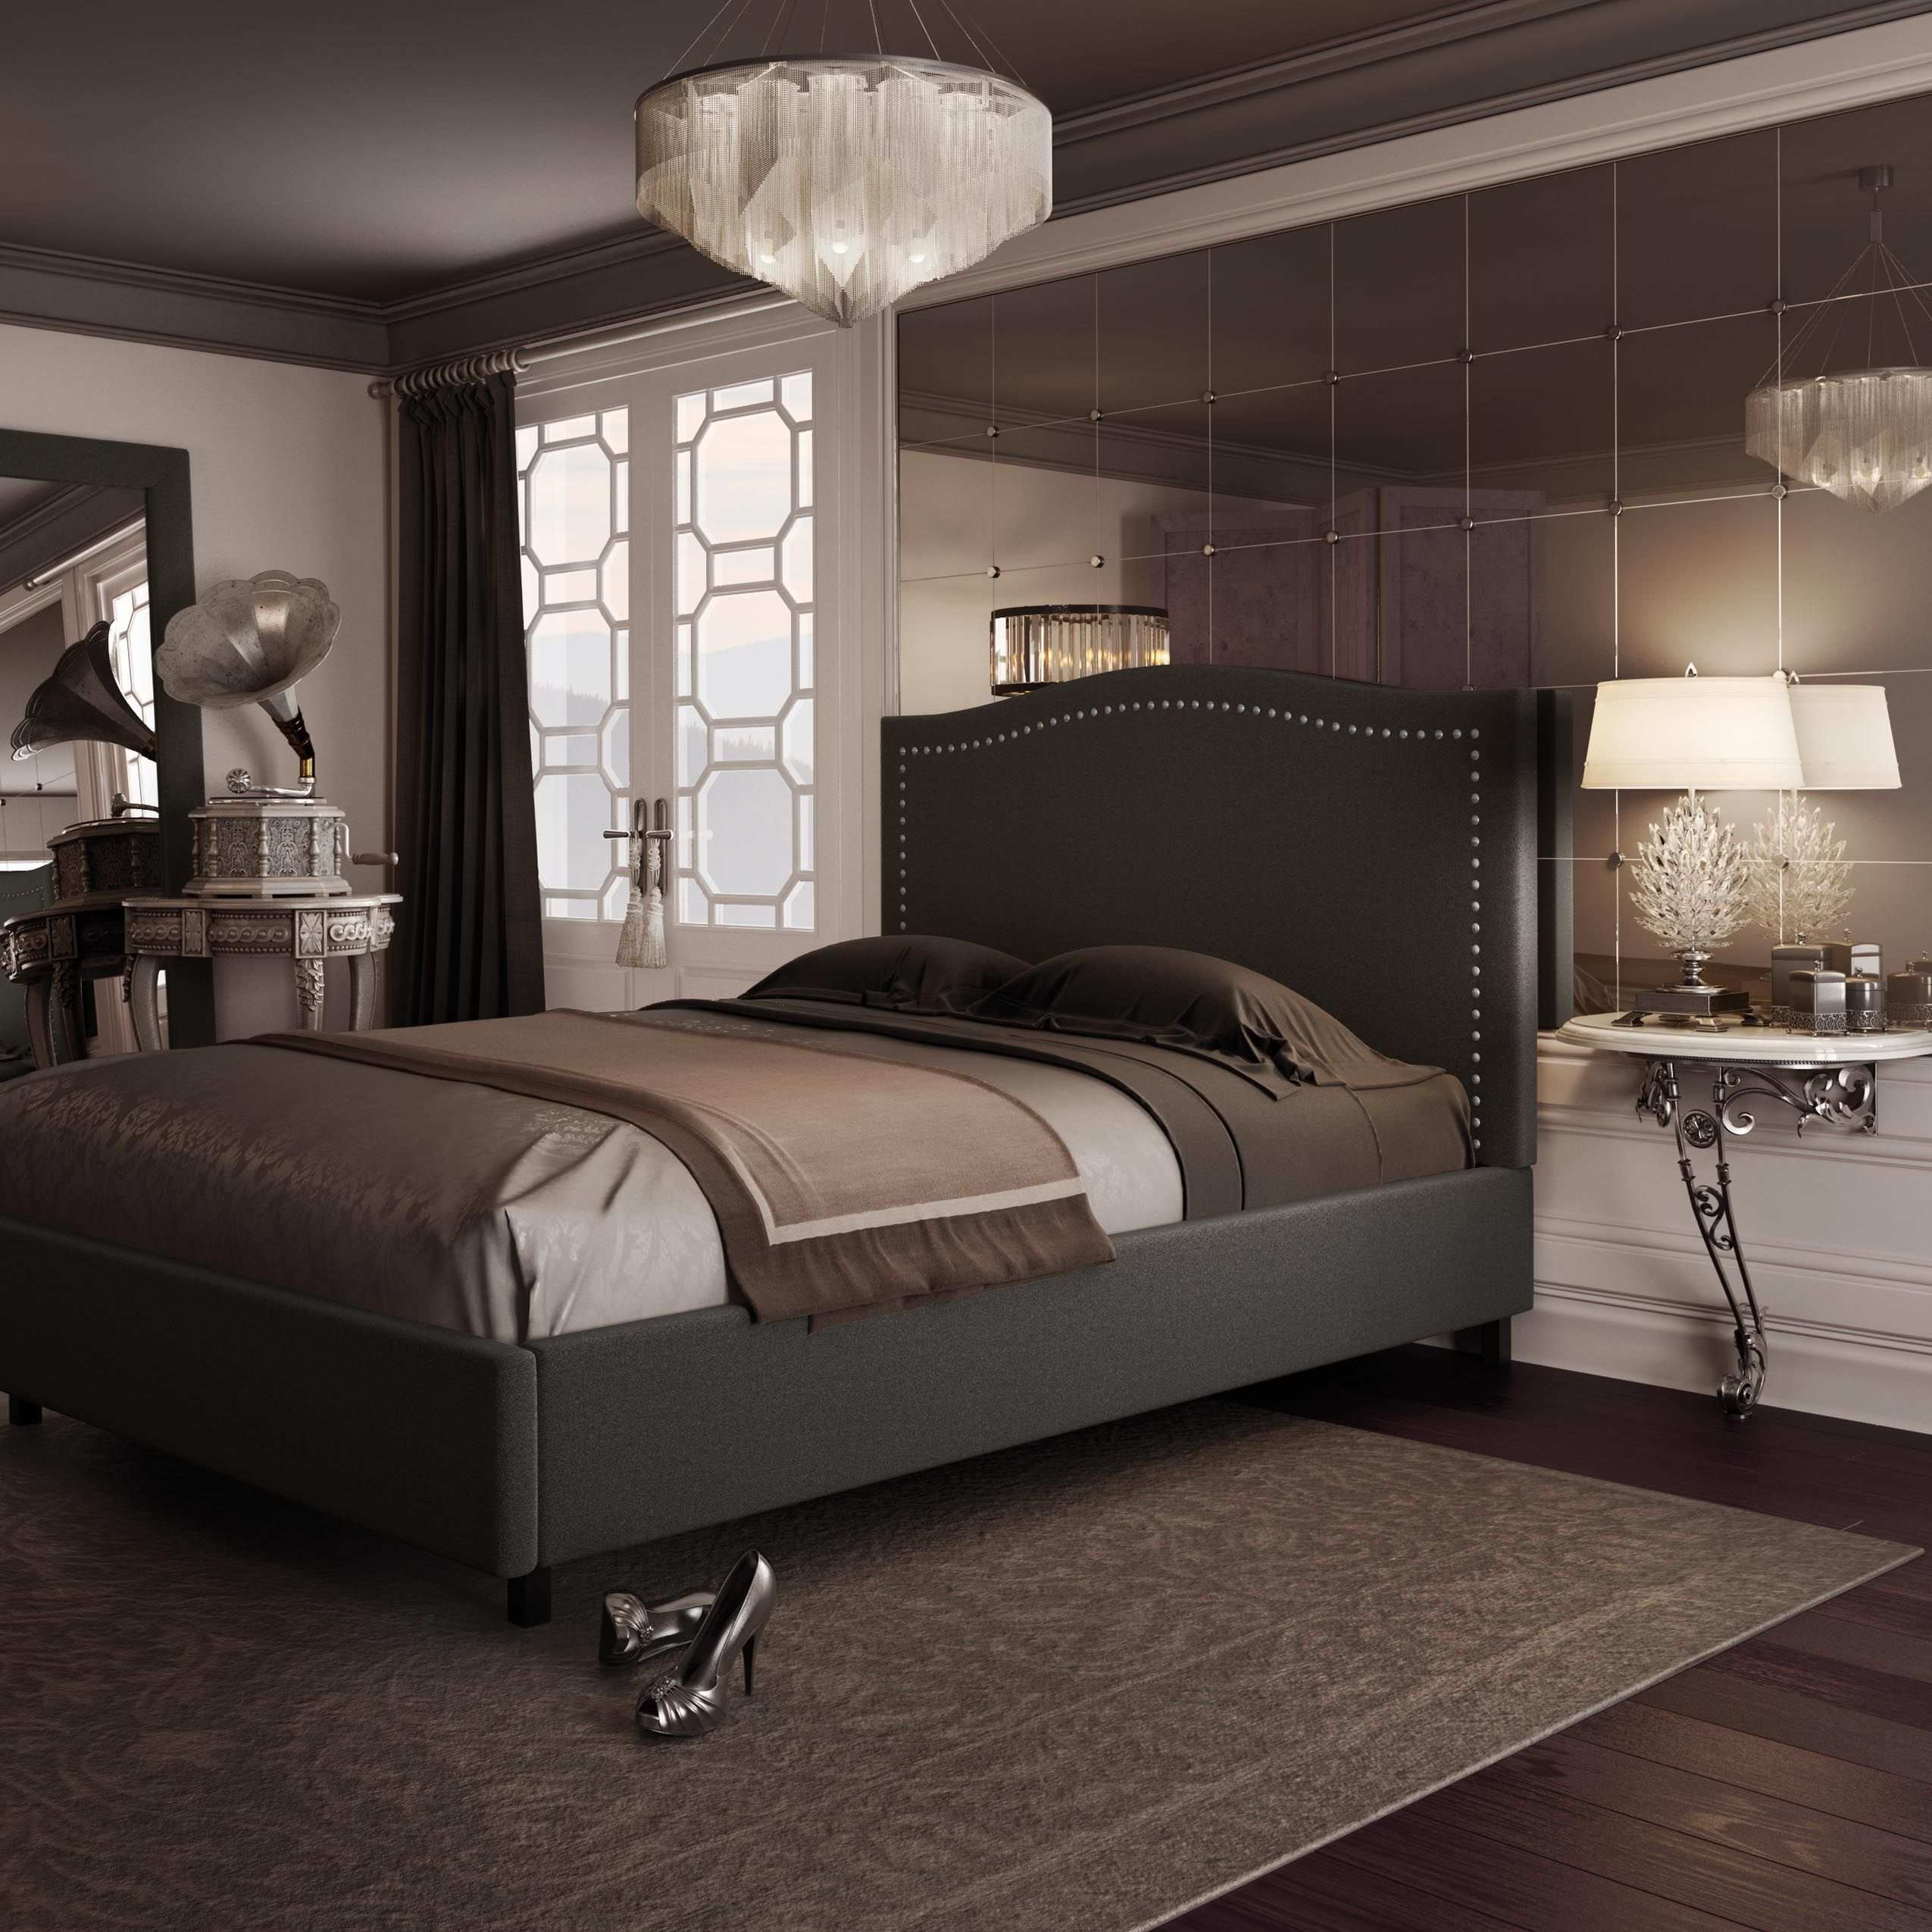 amisco bridge bed 12371 furniture bedroom urban. AMISCO - Elegance Bed (12507) Furniture Bedroom Boudoir Collection Transitional Amisco Bridge 12371 Urban